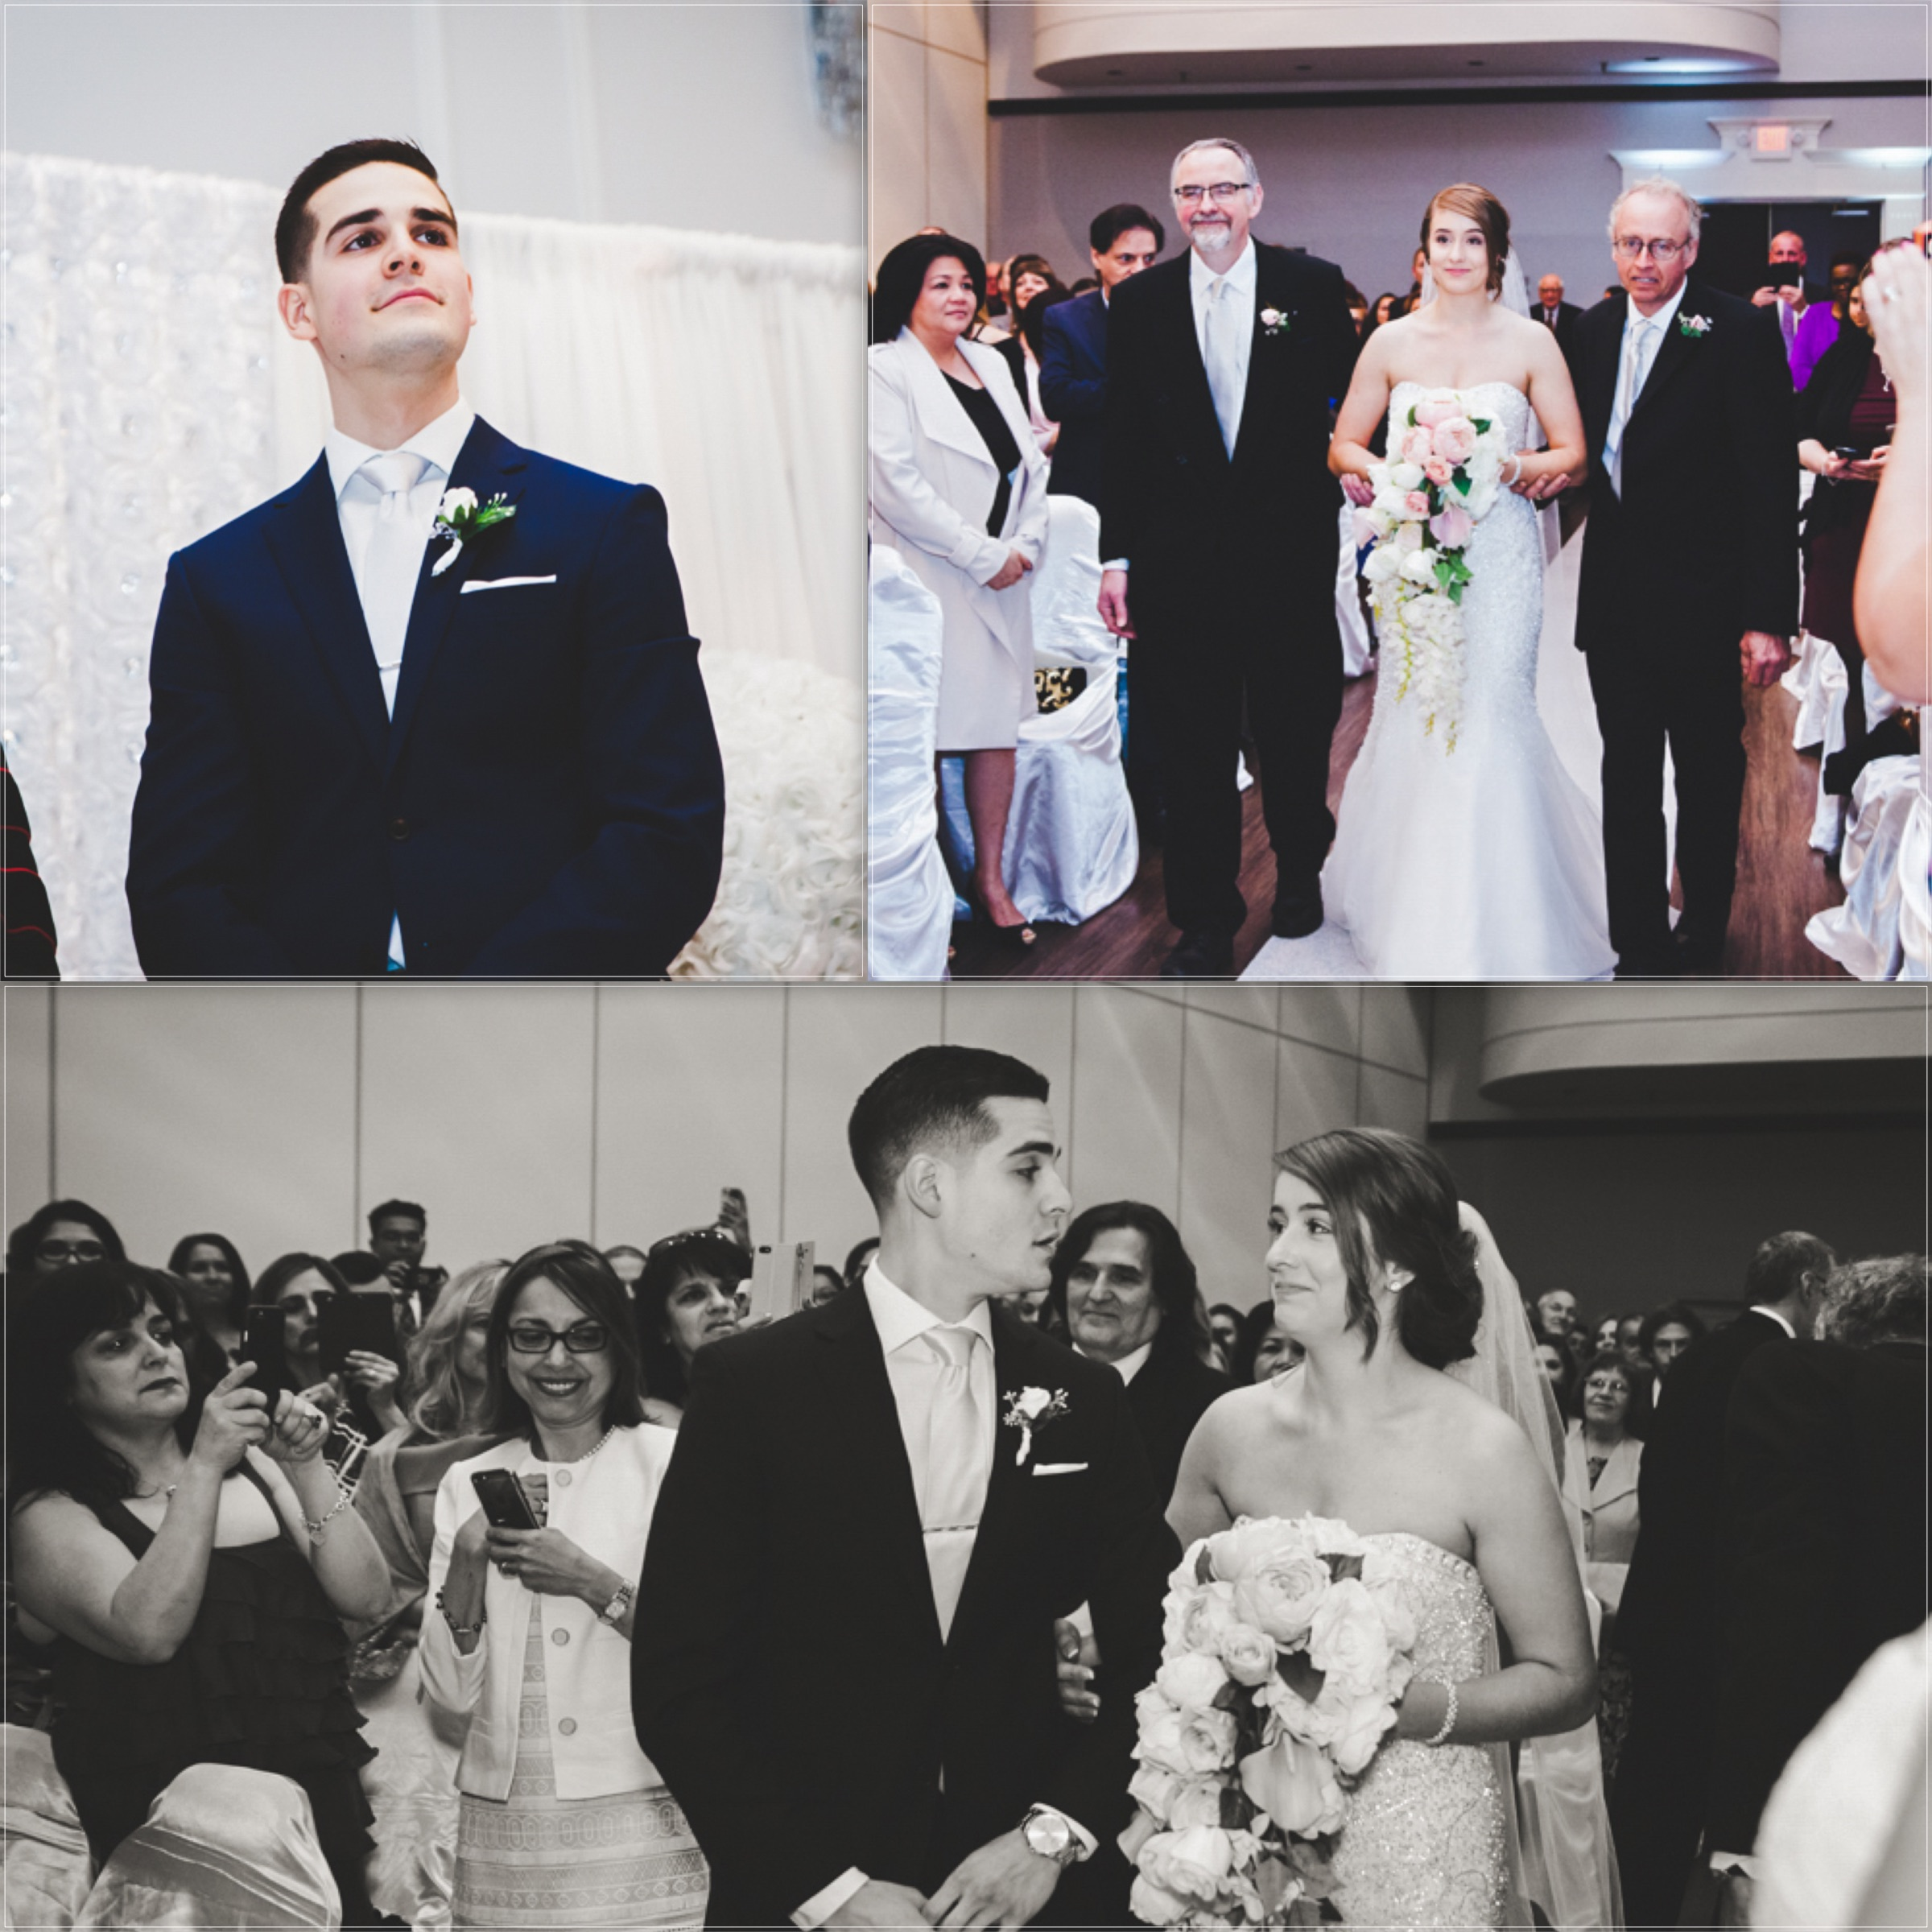 FIRST LOOK OF THE BRIDE REVEAL WEDDING PHOTOS   TORONTO WEDDING PHOTOGRAPHER